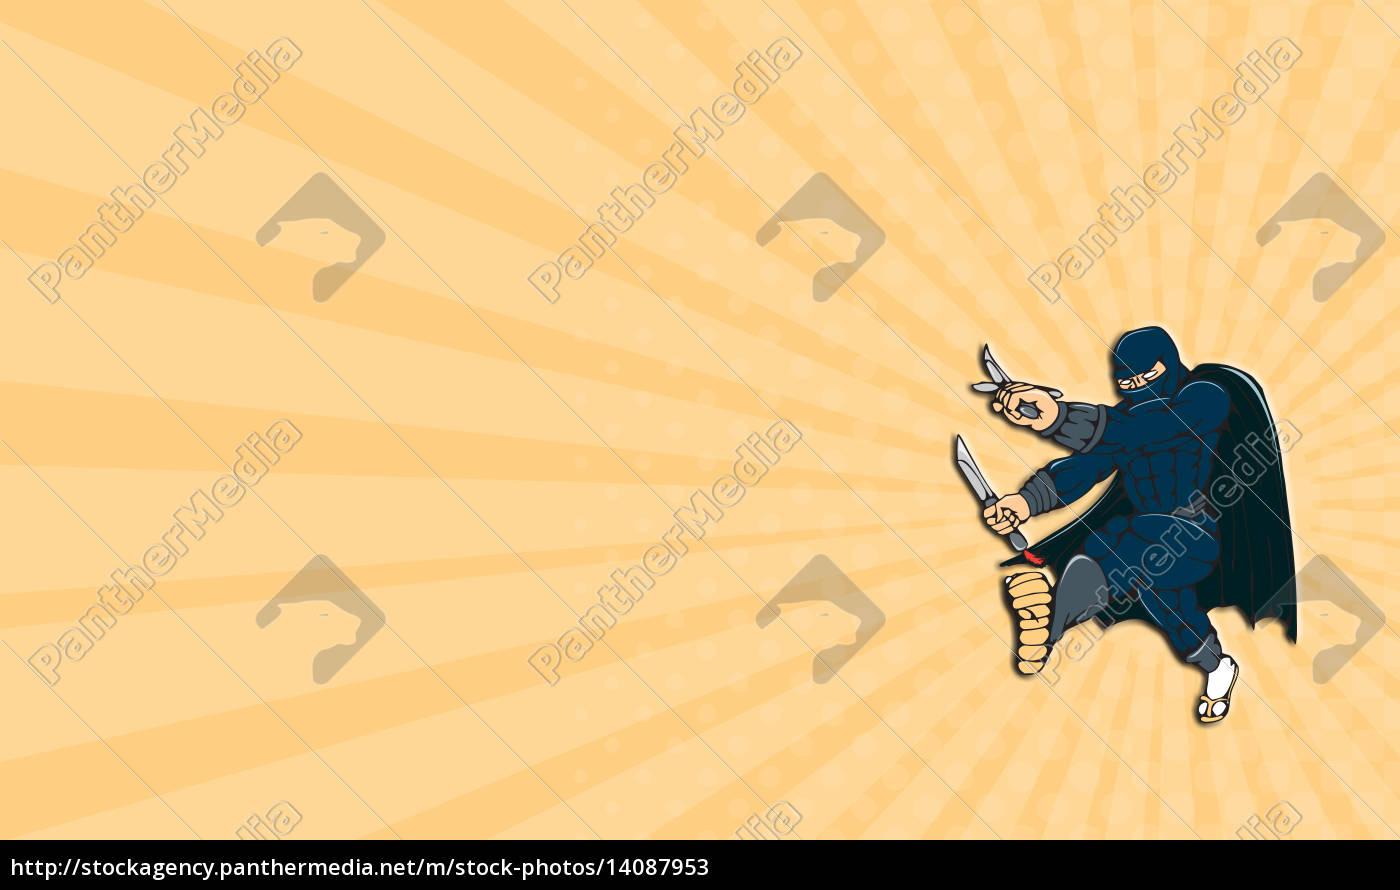 business, card, ninja, masked, warrior, kicking - 14087953